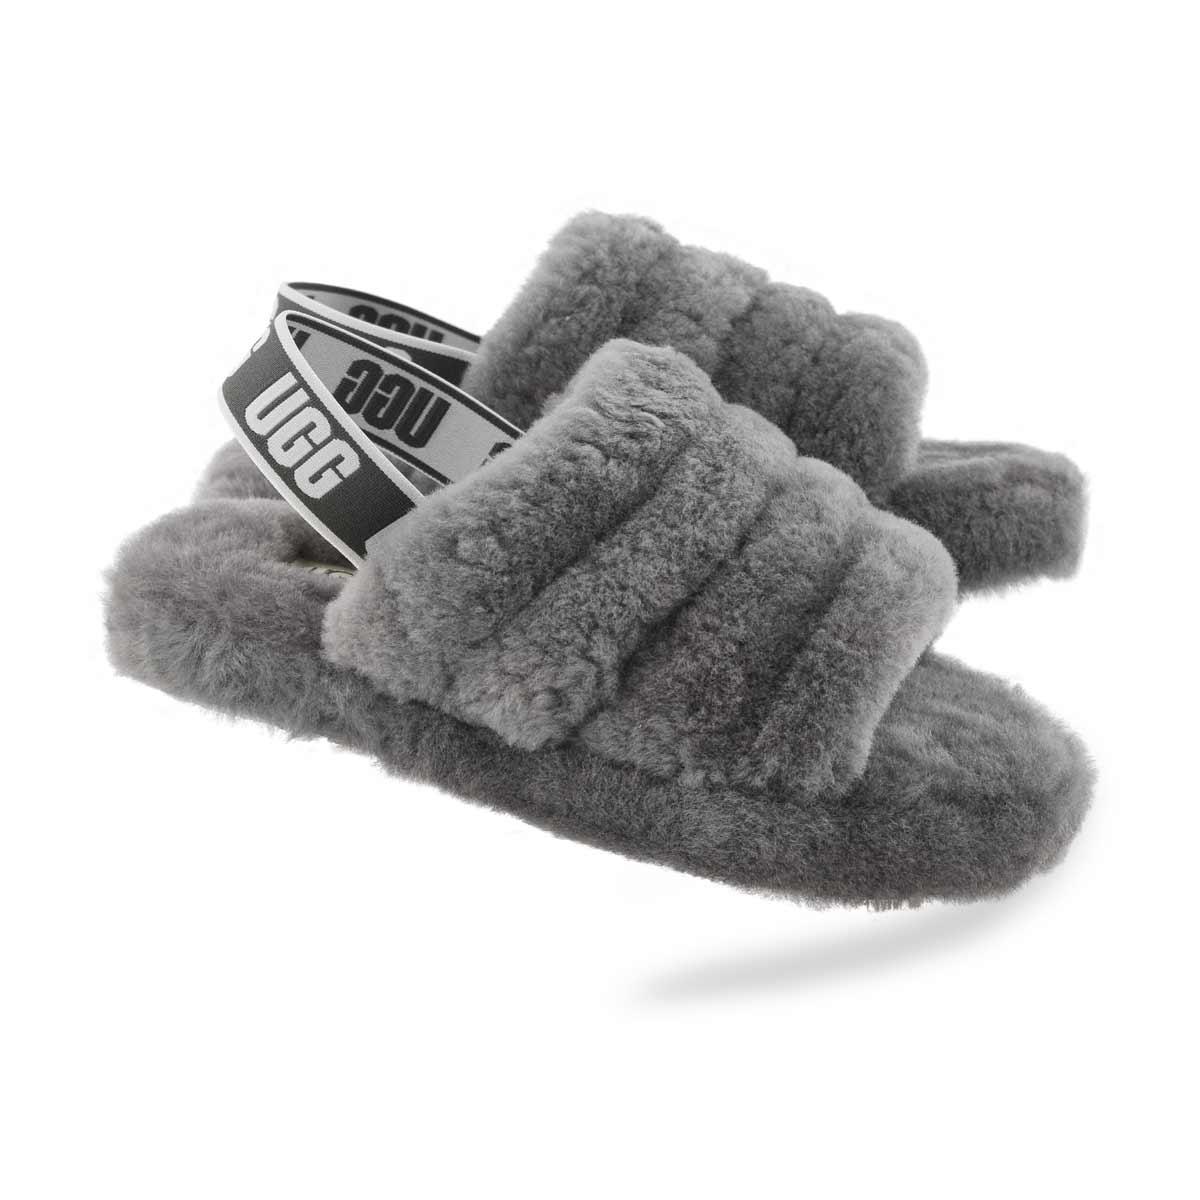 Grls Fluff Yeah char sheepskin slipper